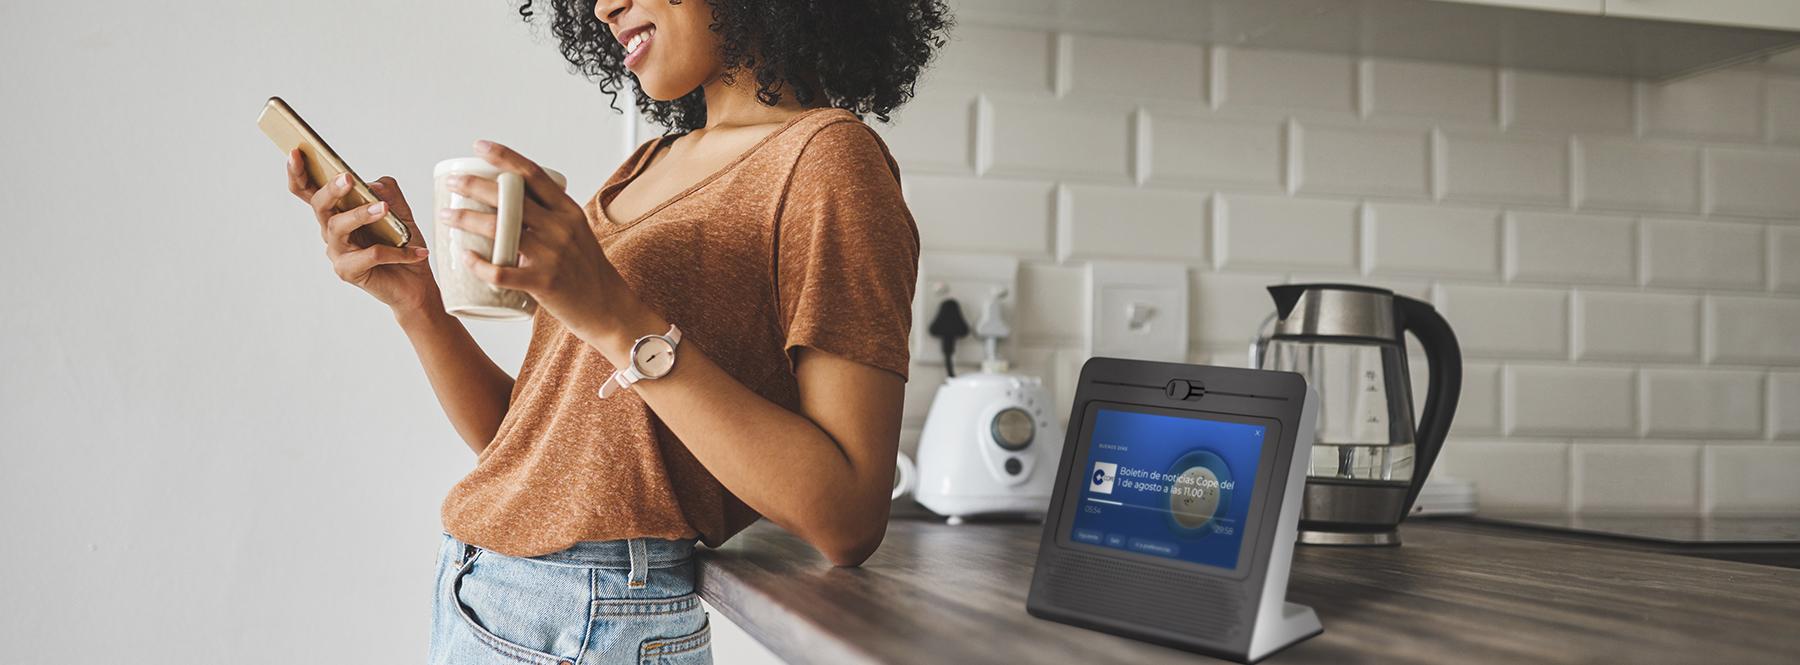 Guía: cómo configurar tus rutinas diarias en Movistar Home